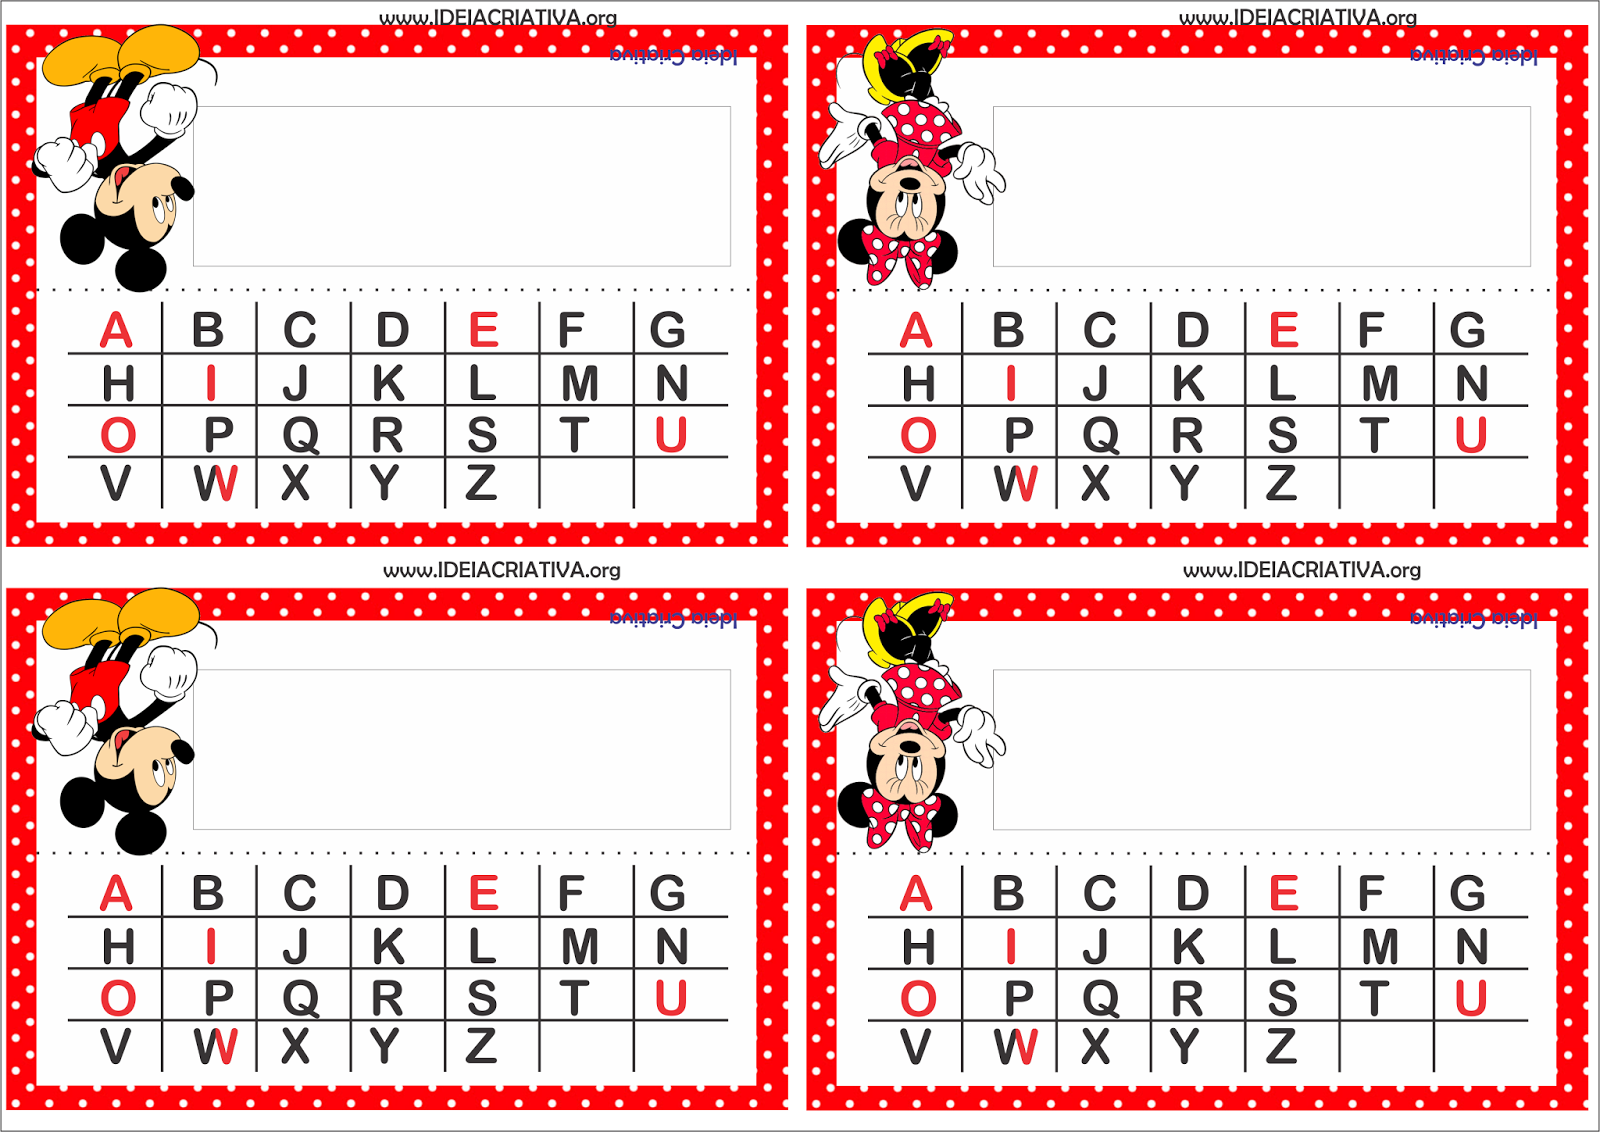 Crachás para Mesa Mickey e Minnie com Alfabeto